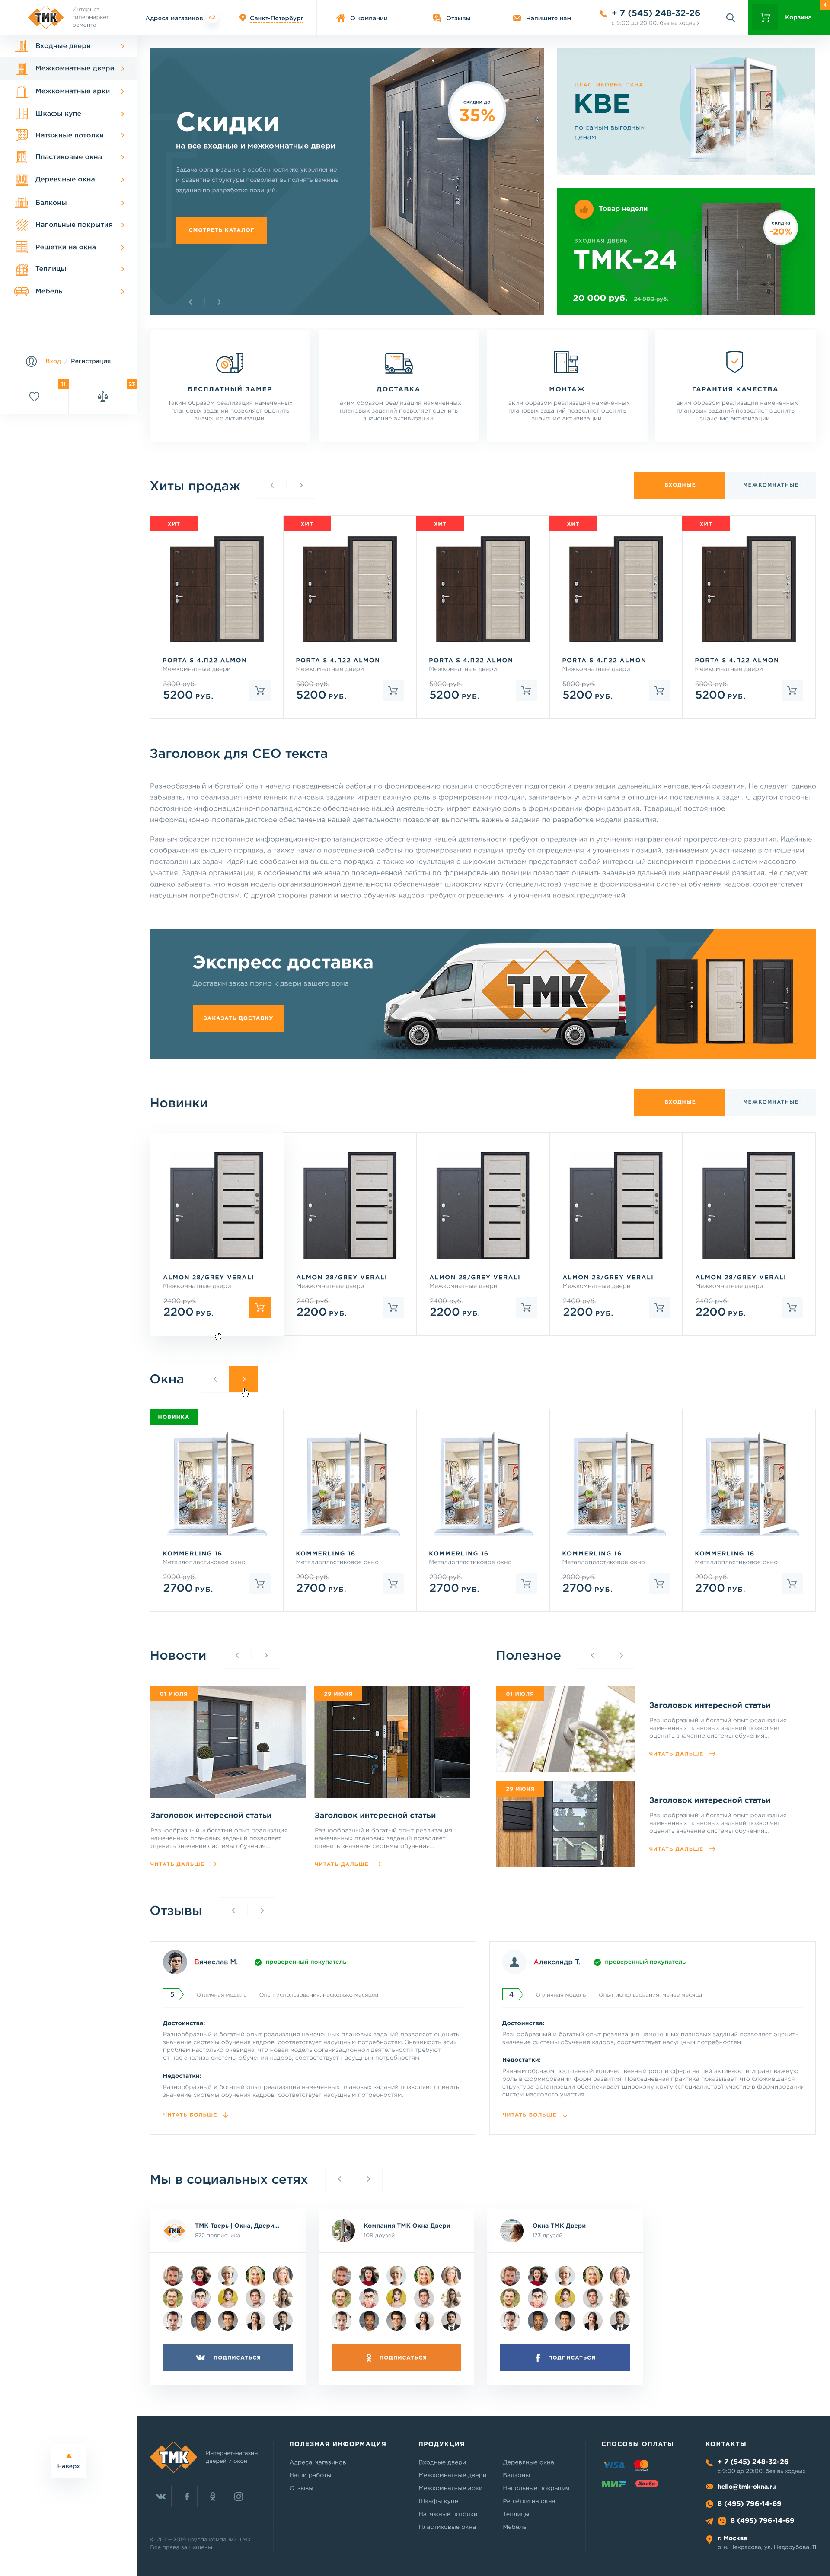 TMK_01_Home_page_1.0